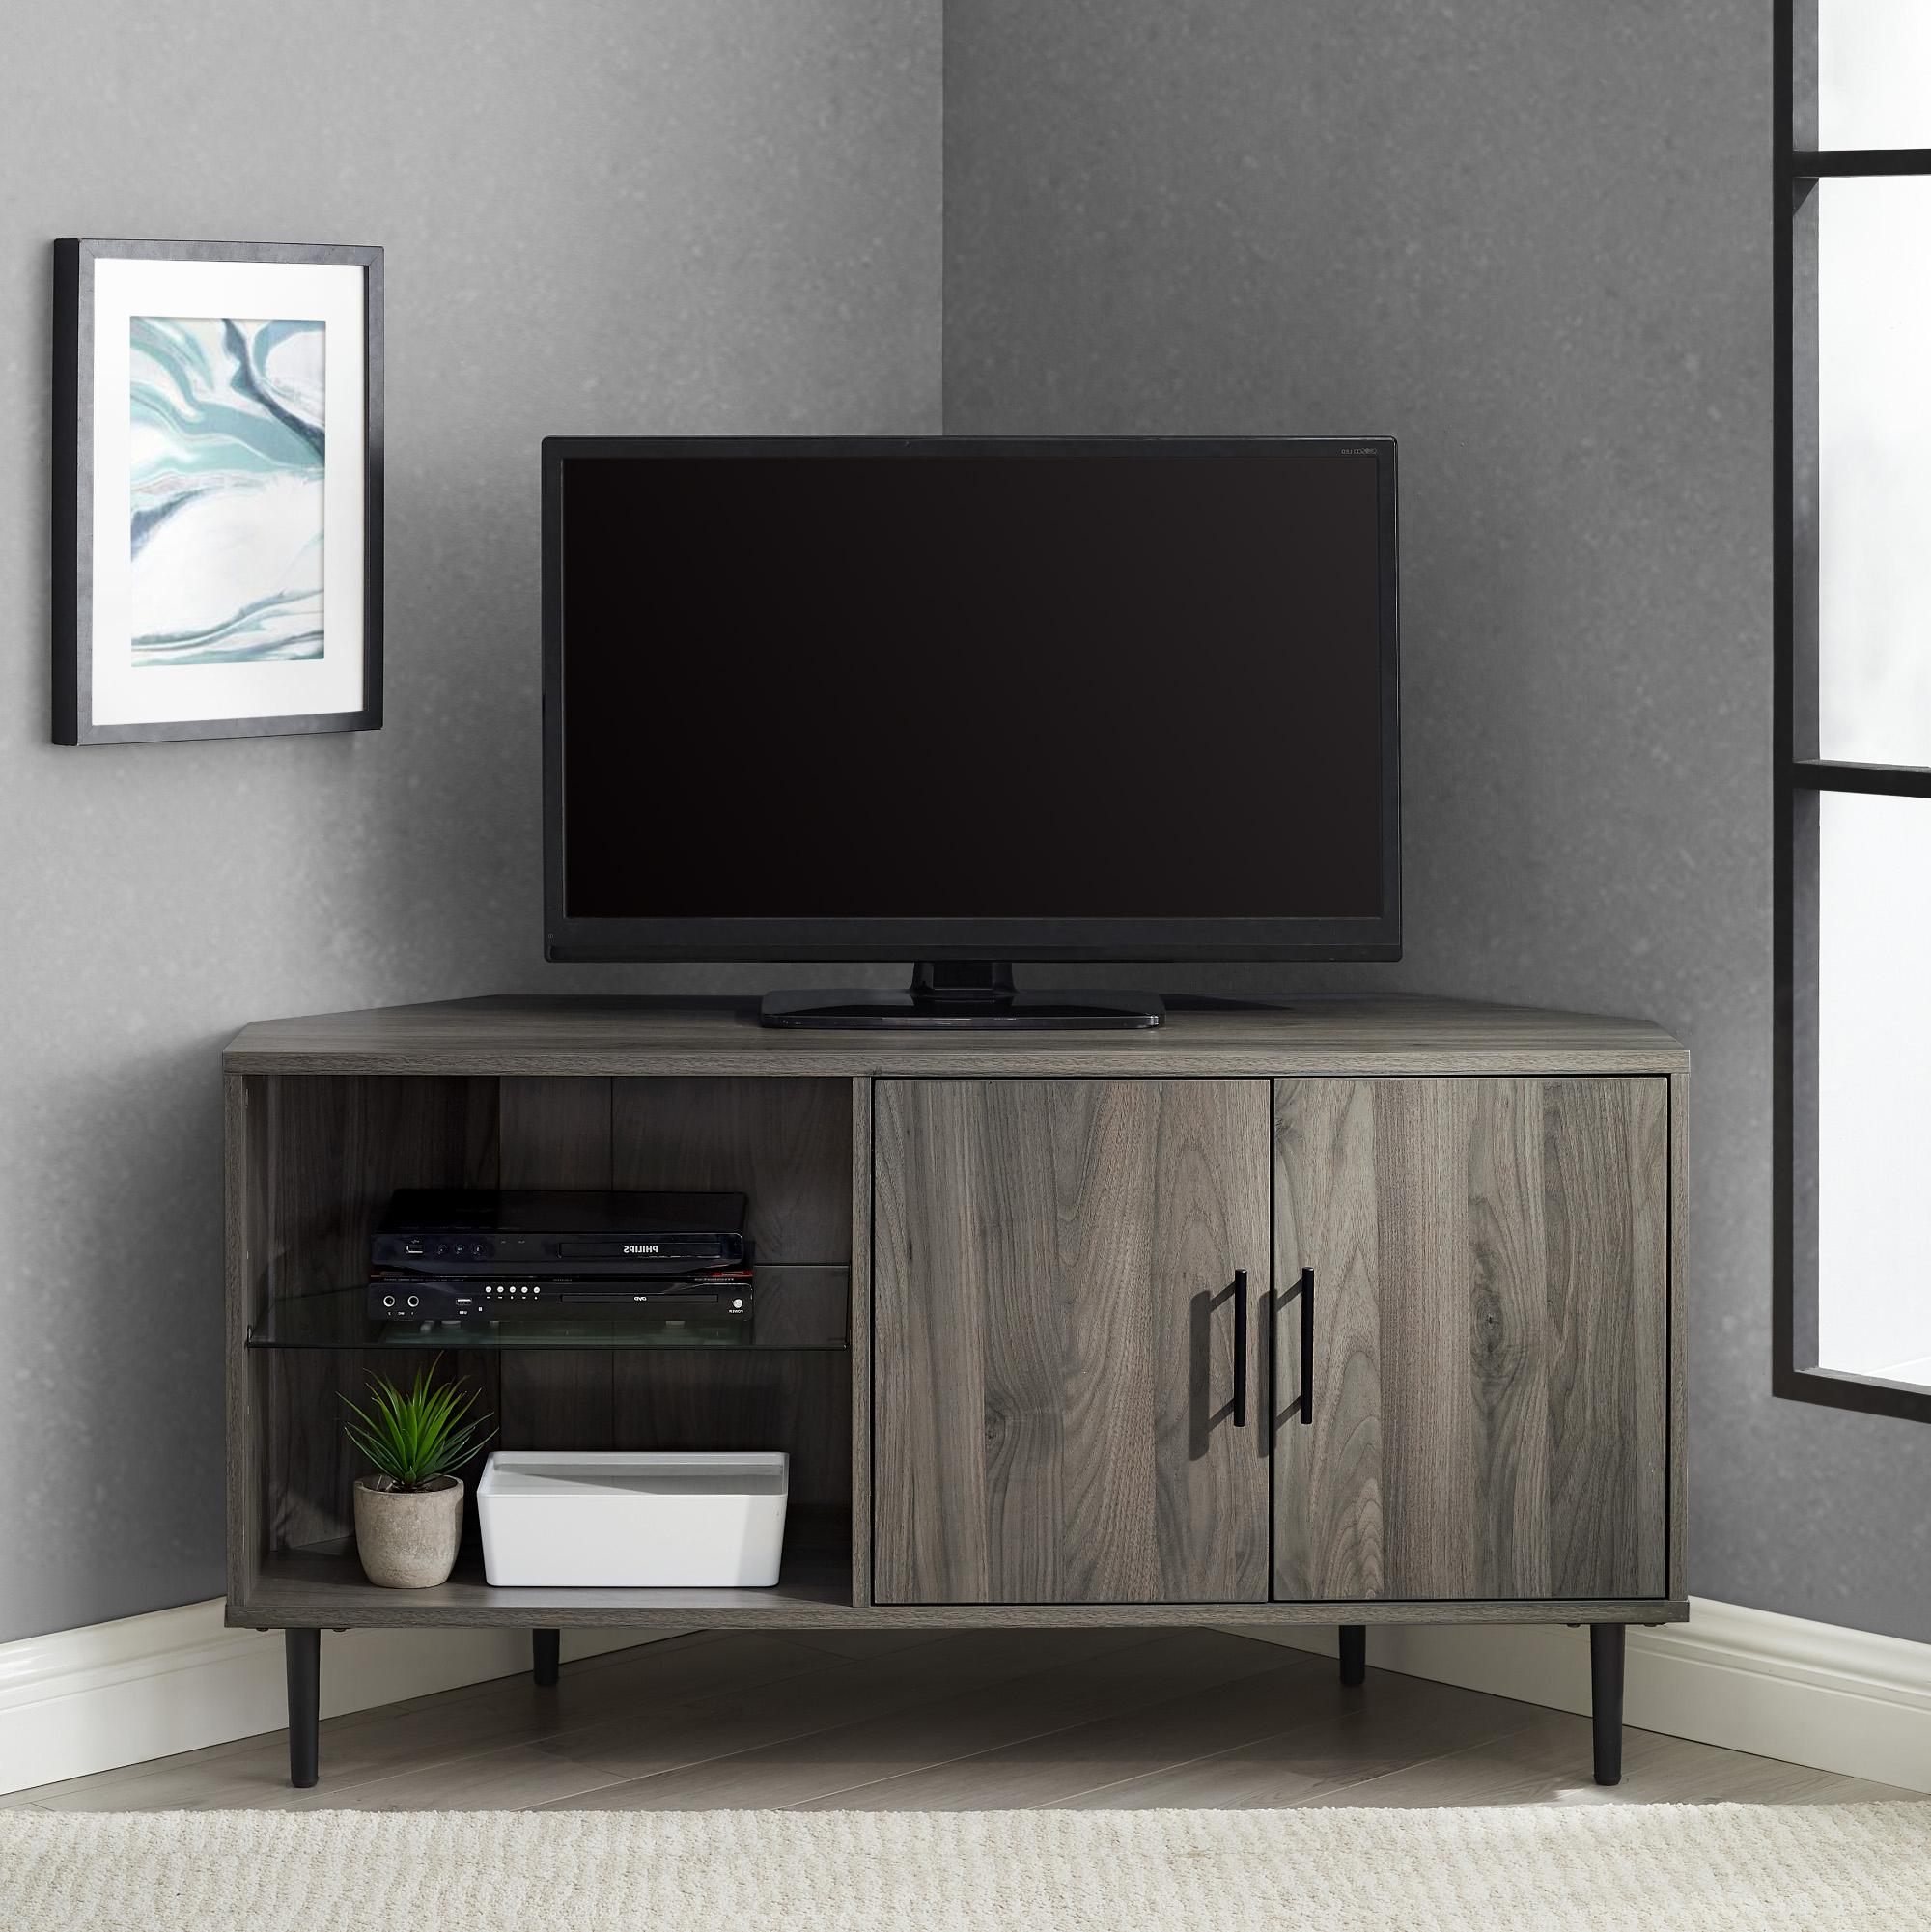 "Most Recently Released Walker Edison Furniture Company 48"" 2 Door Glass Shelf Throughout Basie 2 Door Corner Tv Stands For Tvs Up To 55"" (View 10 of 10)"